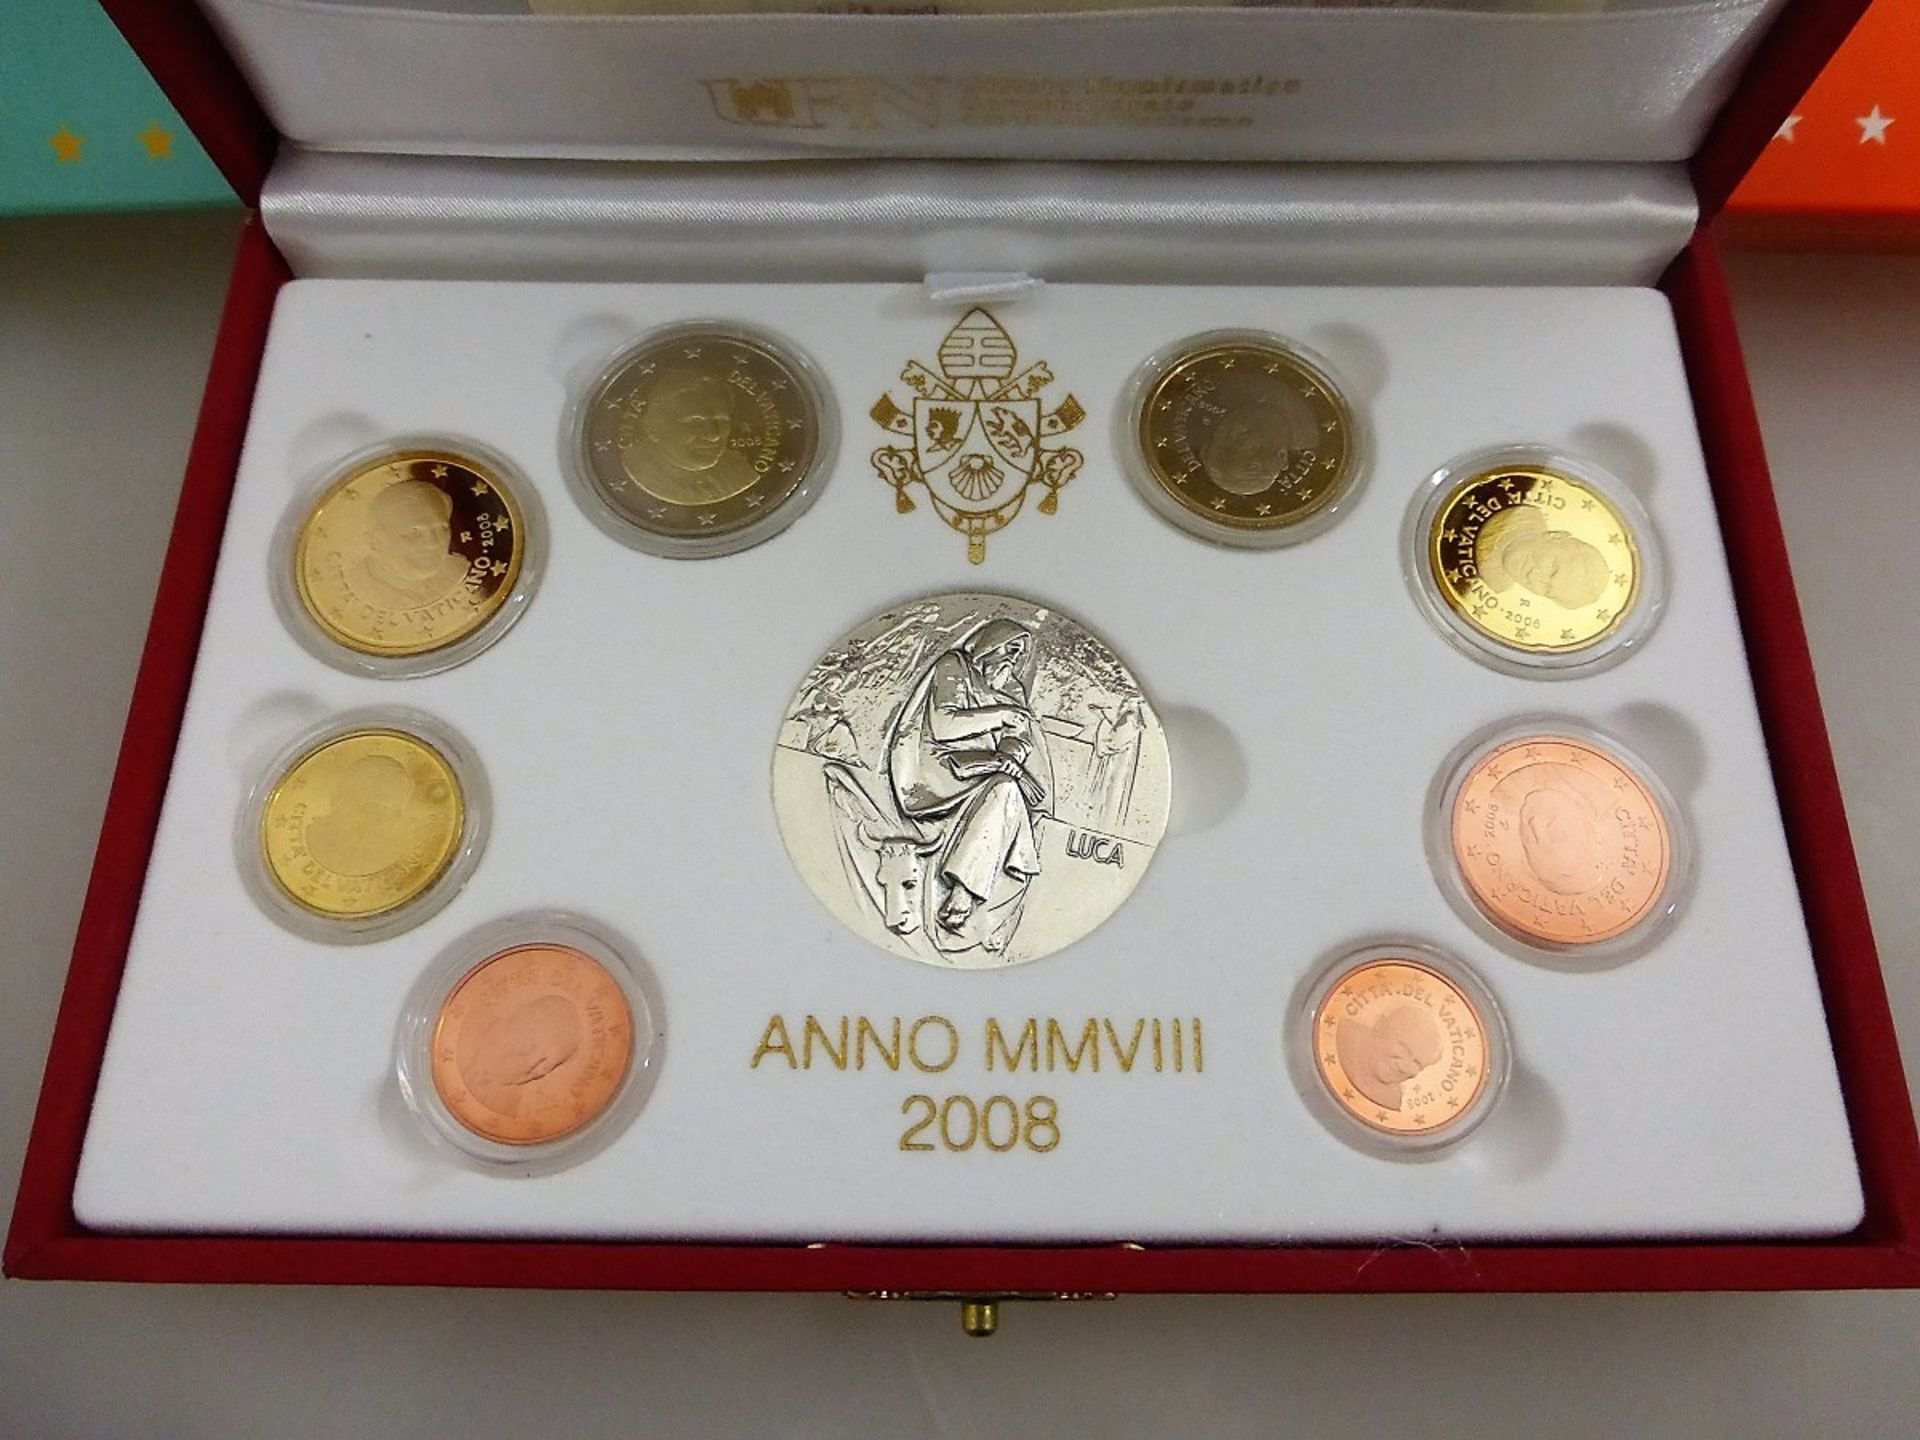 Sammlung Vatikan Münzen - Image 2 of 4